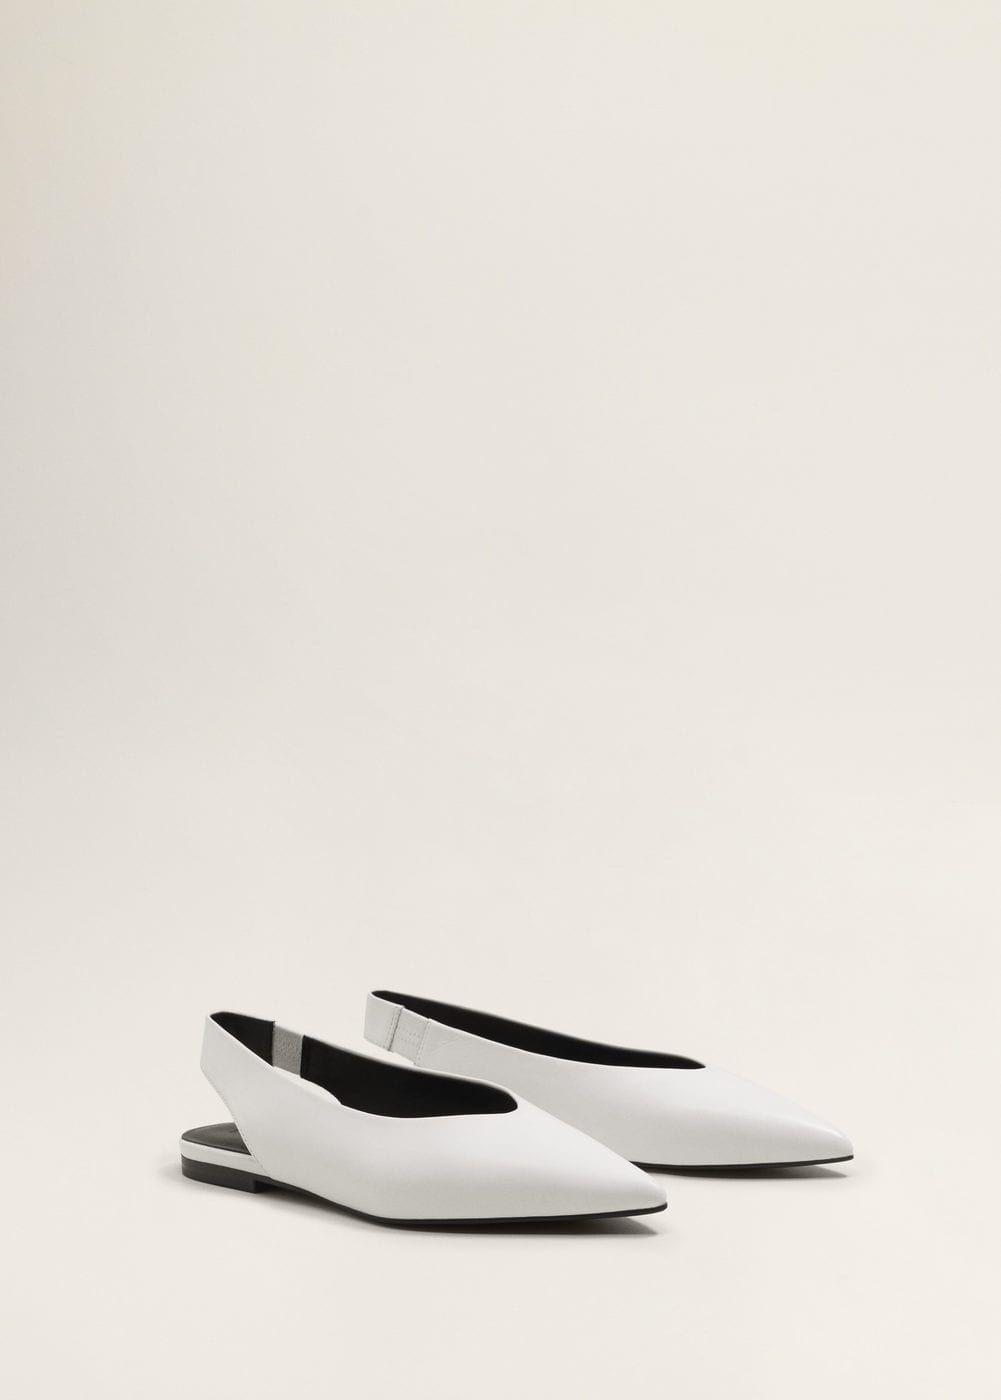 Skorzane Buty W Szpic Kobieta Mango Polska Leather Shoes Woman Leather Shoes Shoes